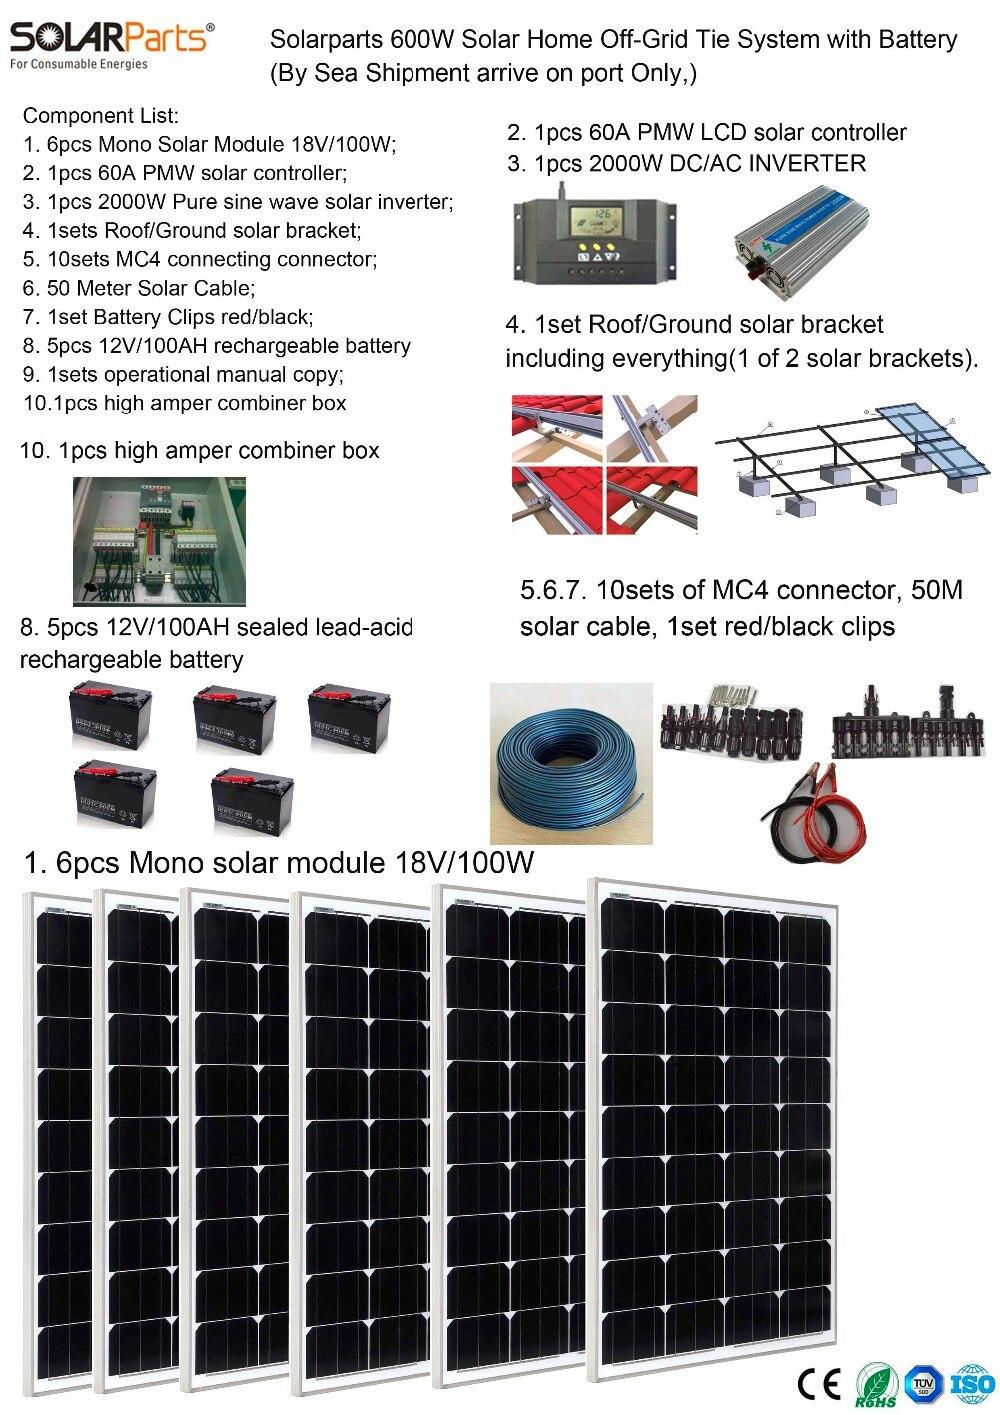 Boguang Solarparts 1x 600W Solar Home off-grid tie systems sea shipment 6pcs 100W mono solar modules bracket DIY kits panel bat